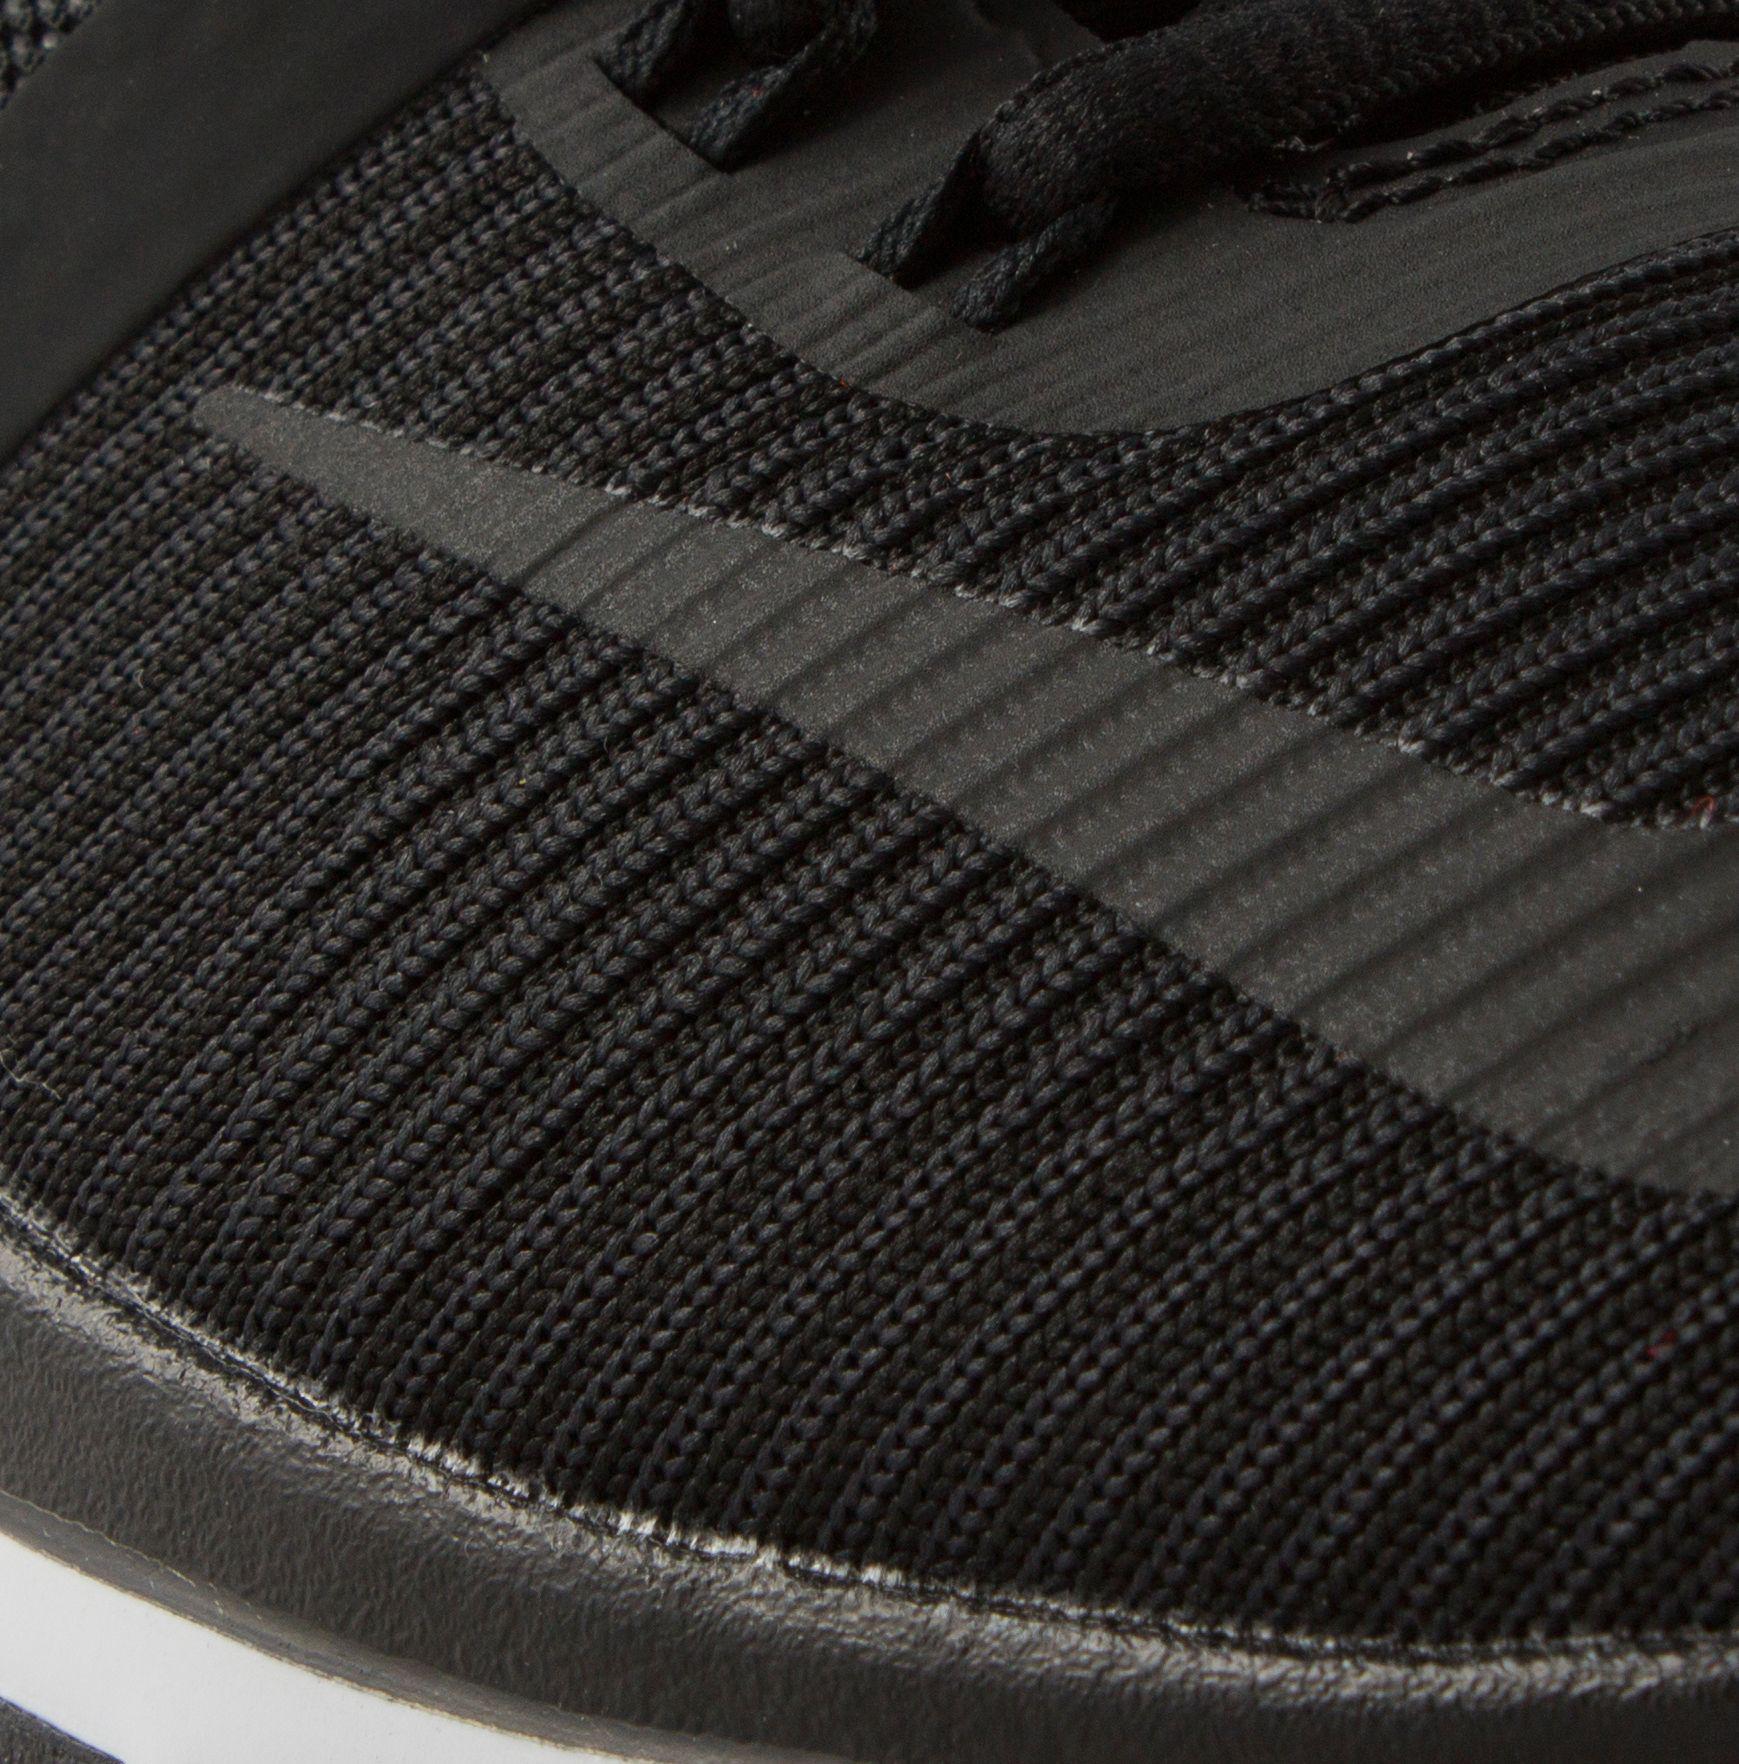 Nike SB Lunar Stefan Janoski White Black Anthrosite Front